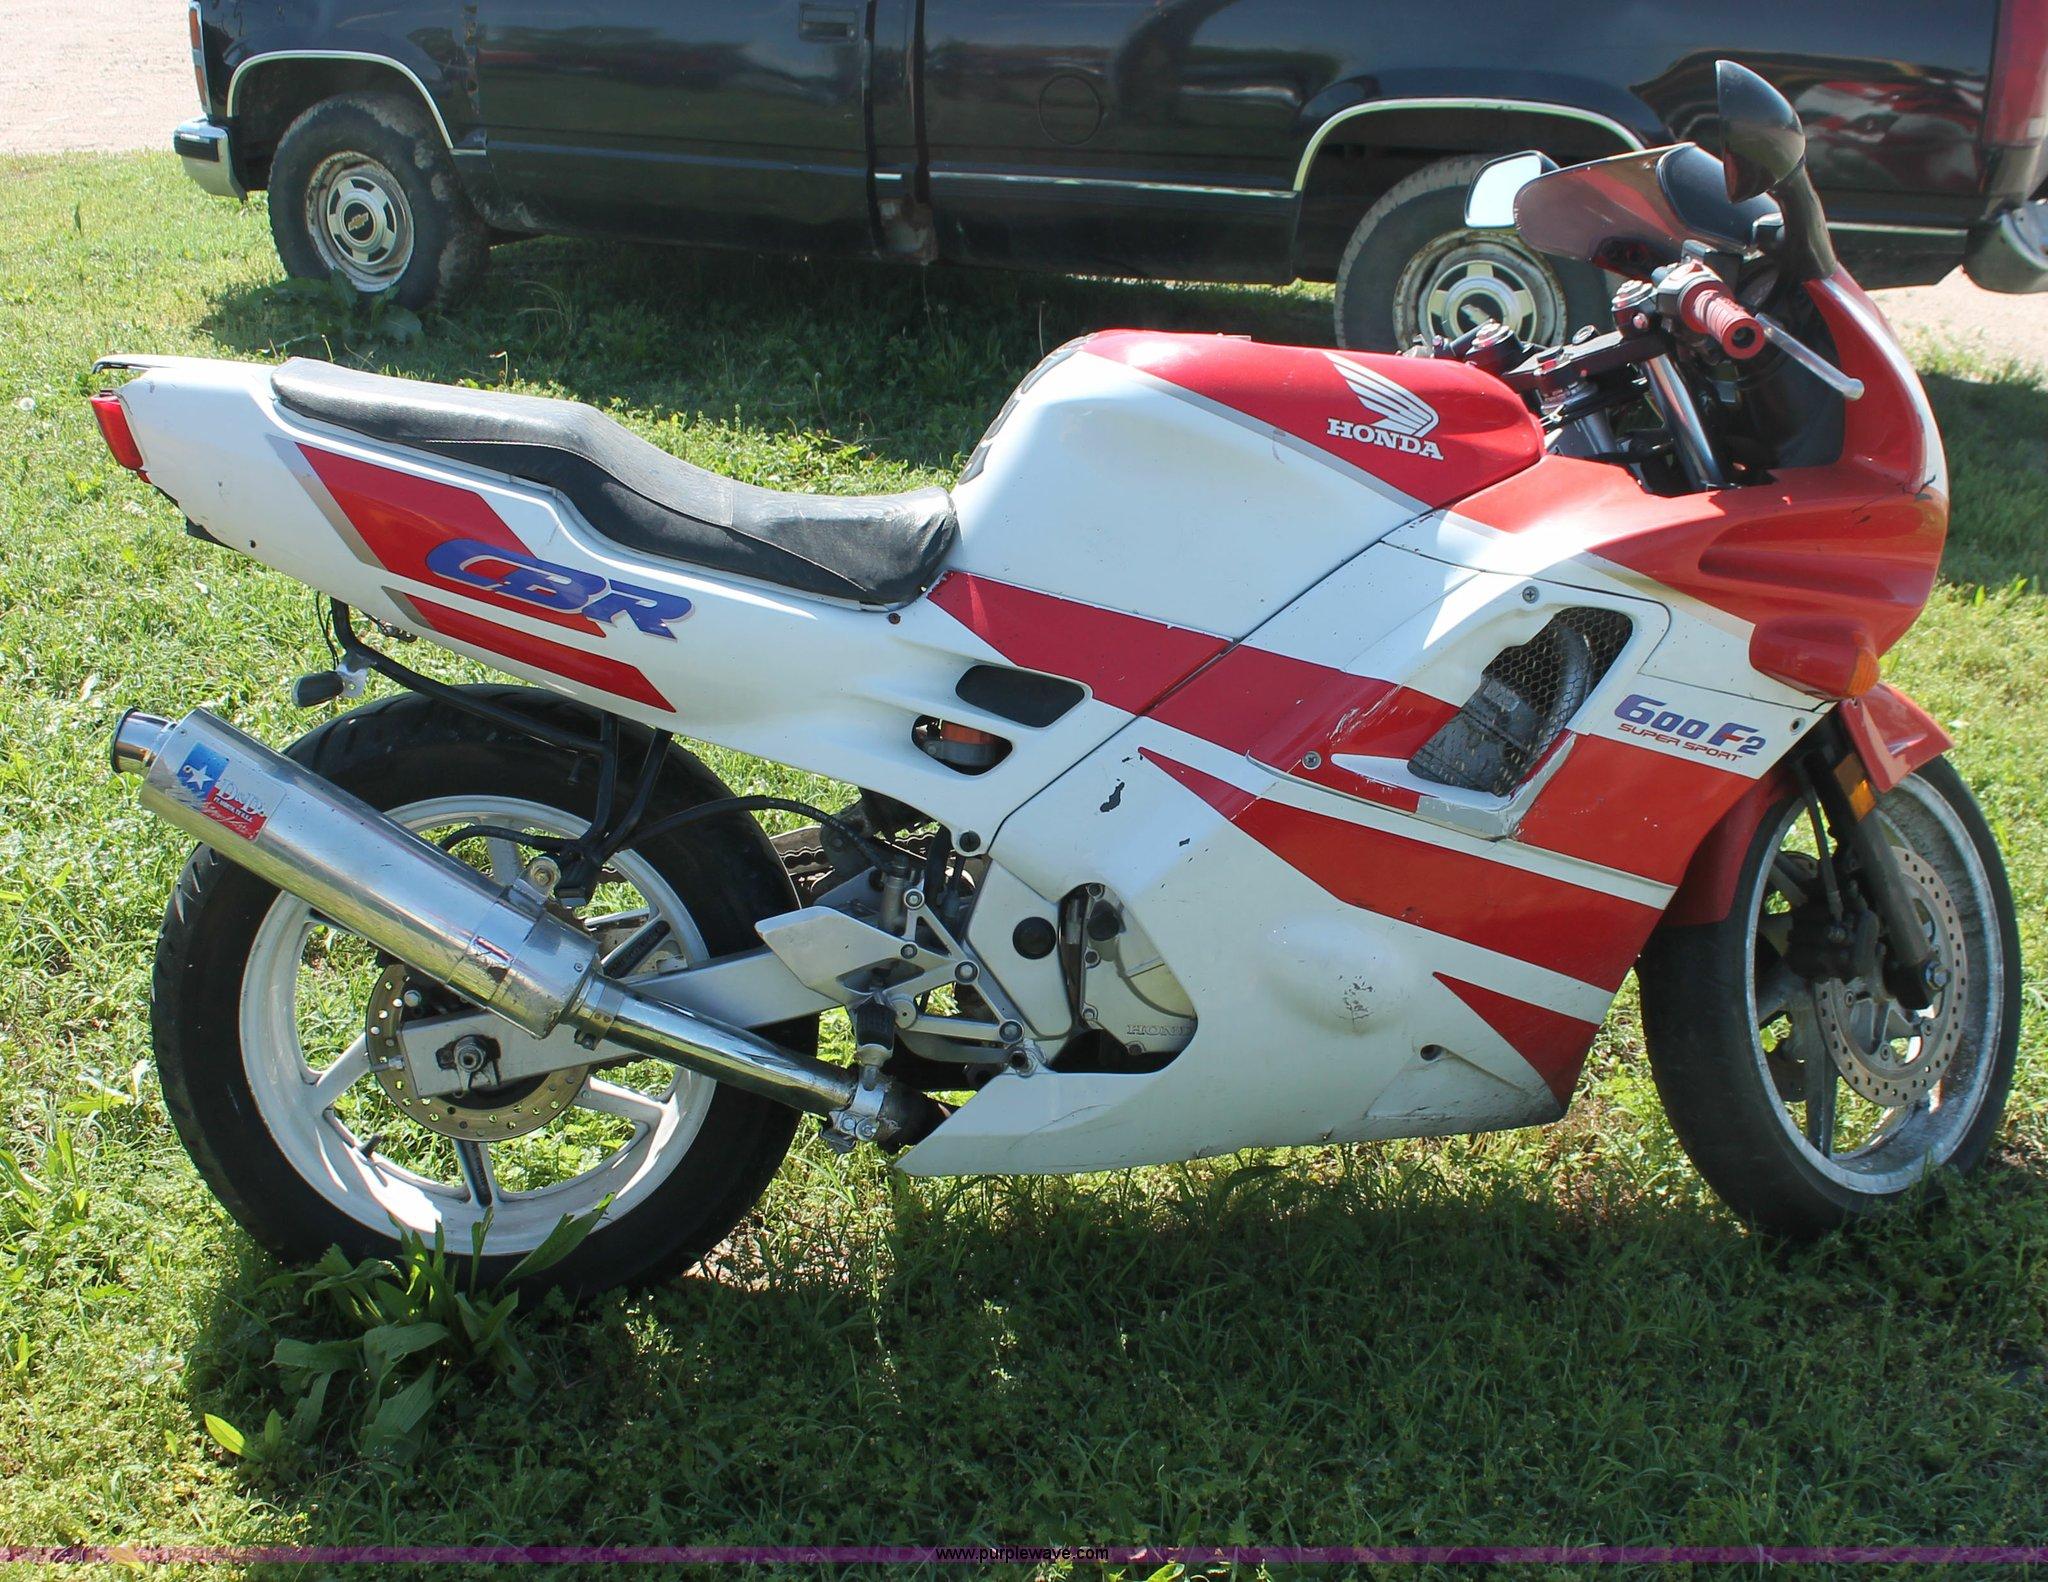 1991 Honda Cbr600f2 Super Sport Motorcycle In Wichita Ks Item H3557 Sold Purple Wave